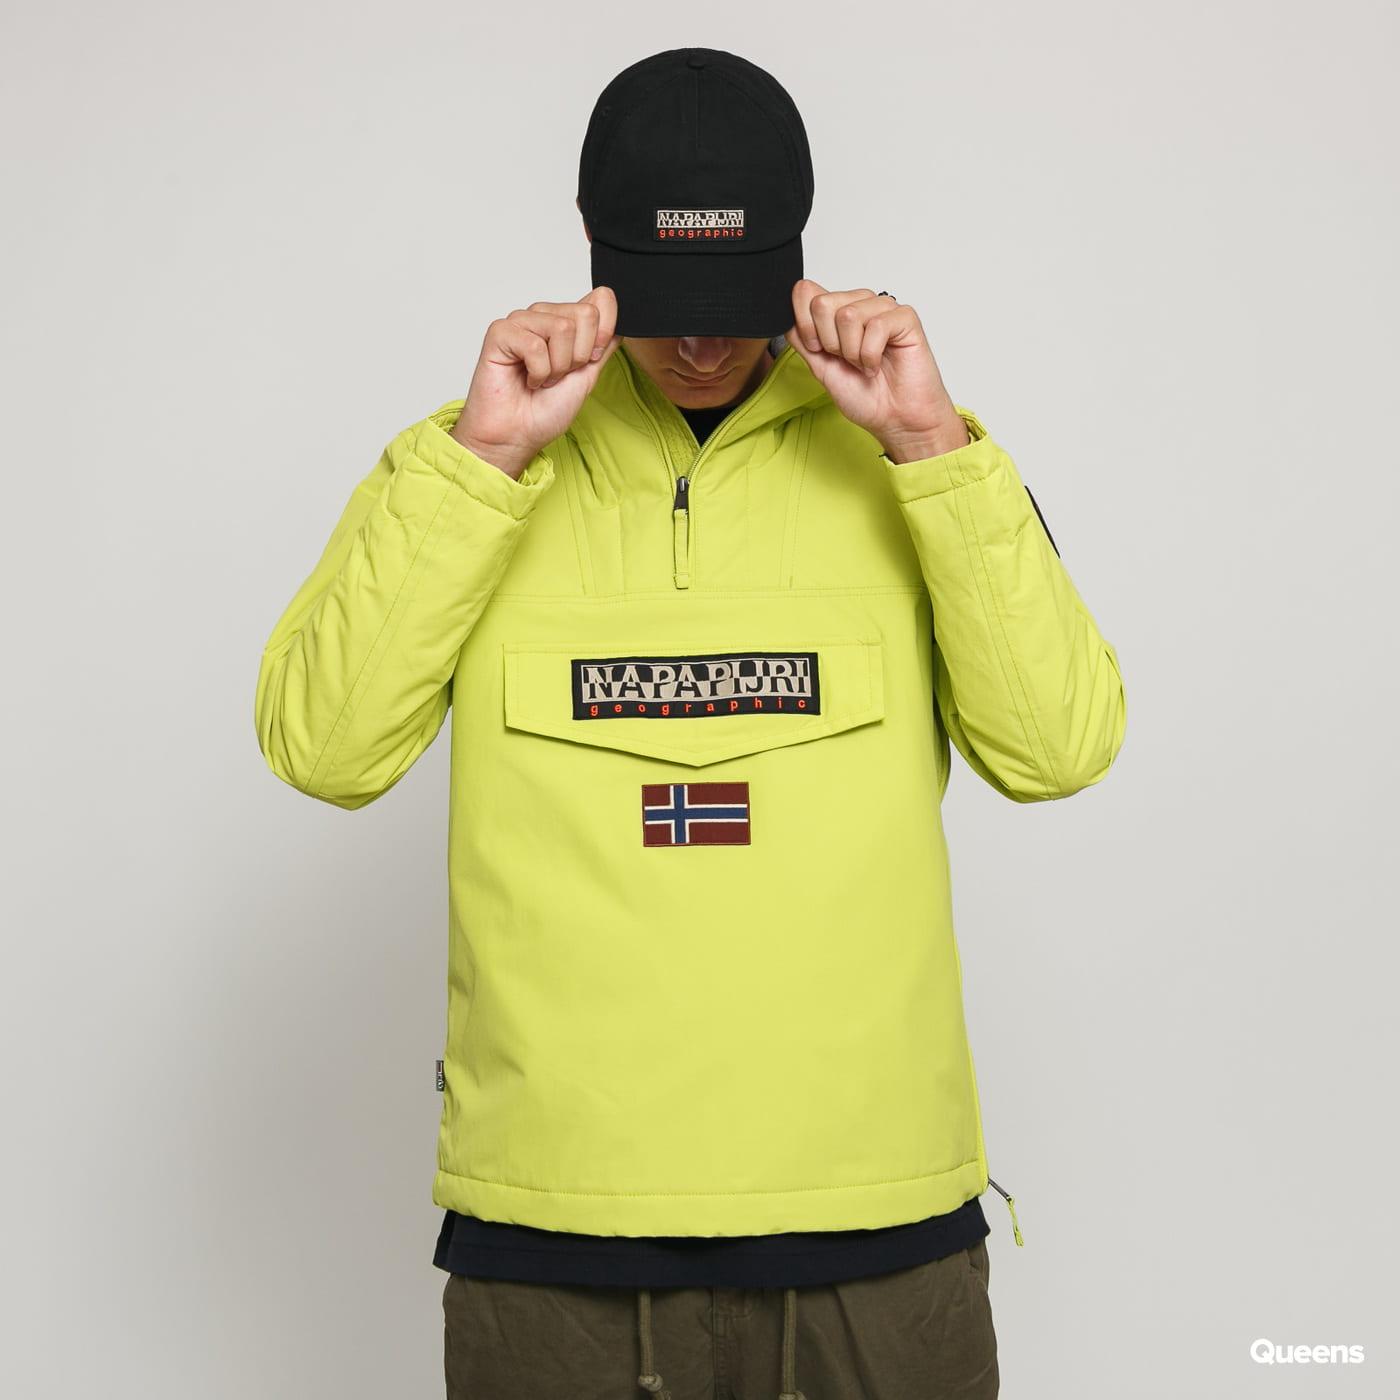 NAPAPIJRI Men/'s lime yellow Rainforest Winter jacket